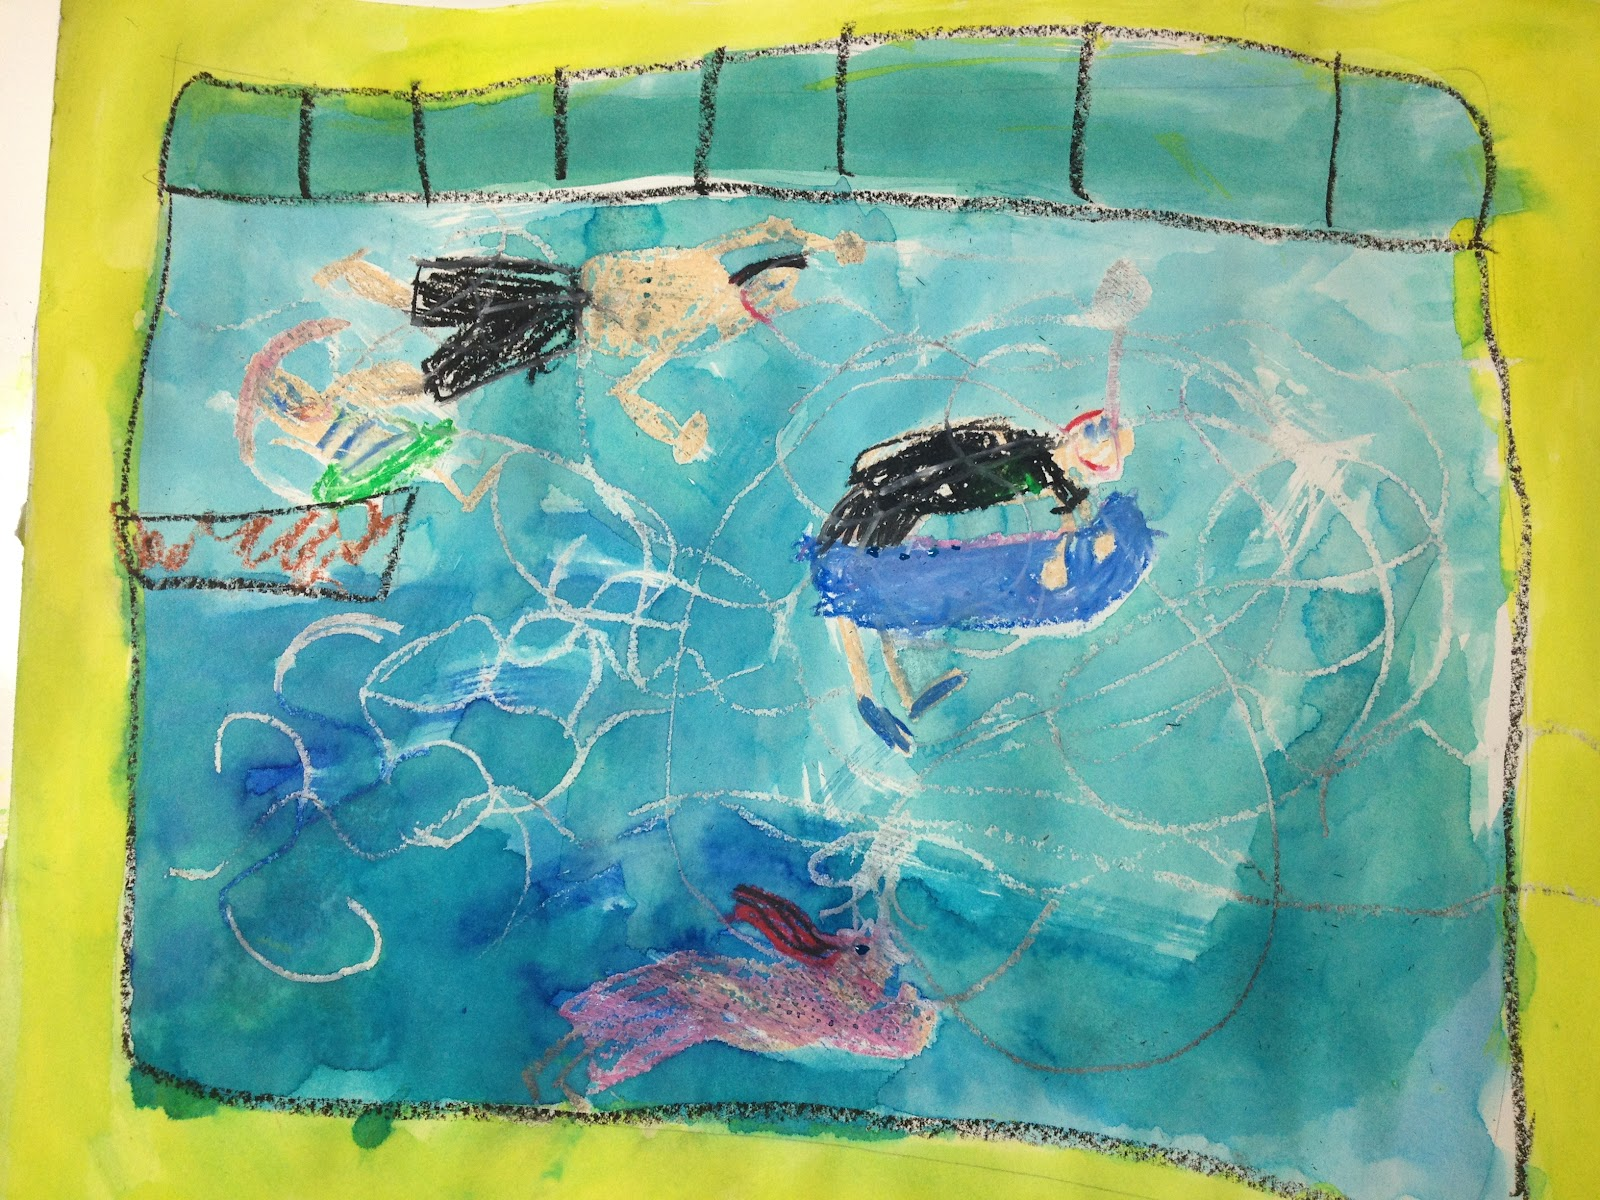 Artfully Me Swimming Pool Art David Hockney Inspired Lesson With Sydney Alaina Katelyn